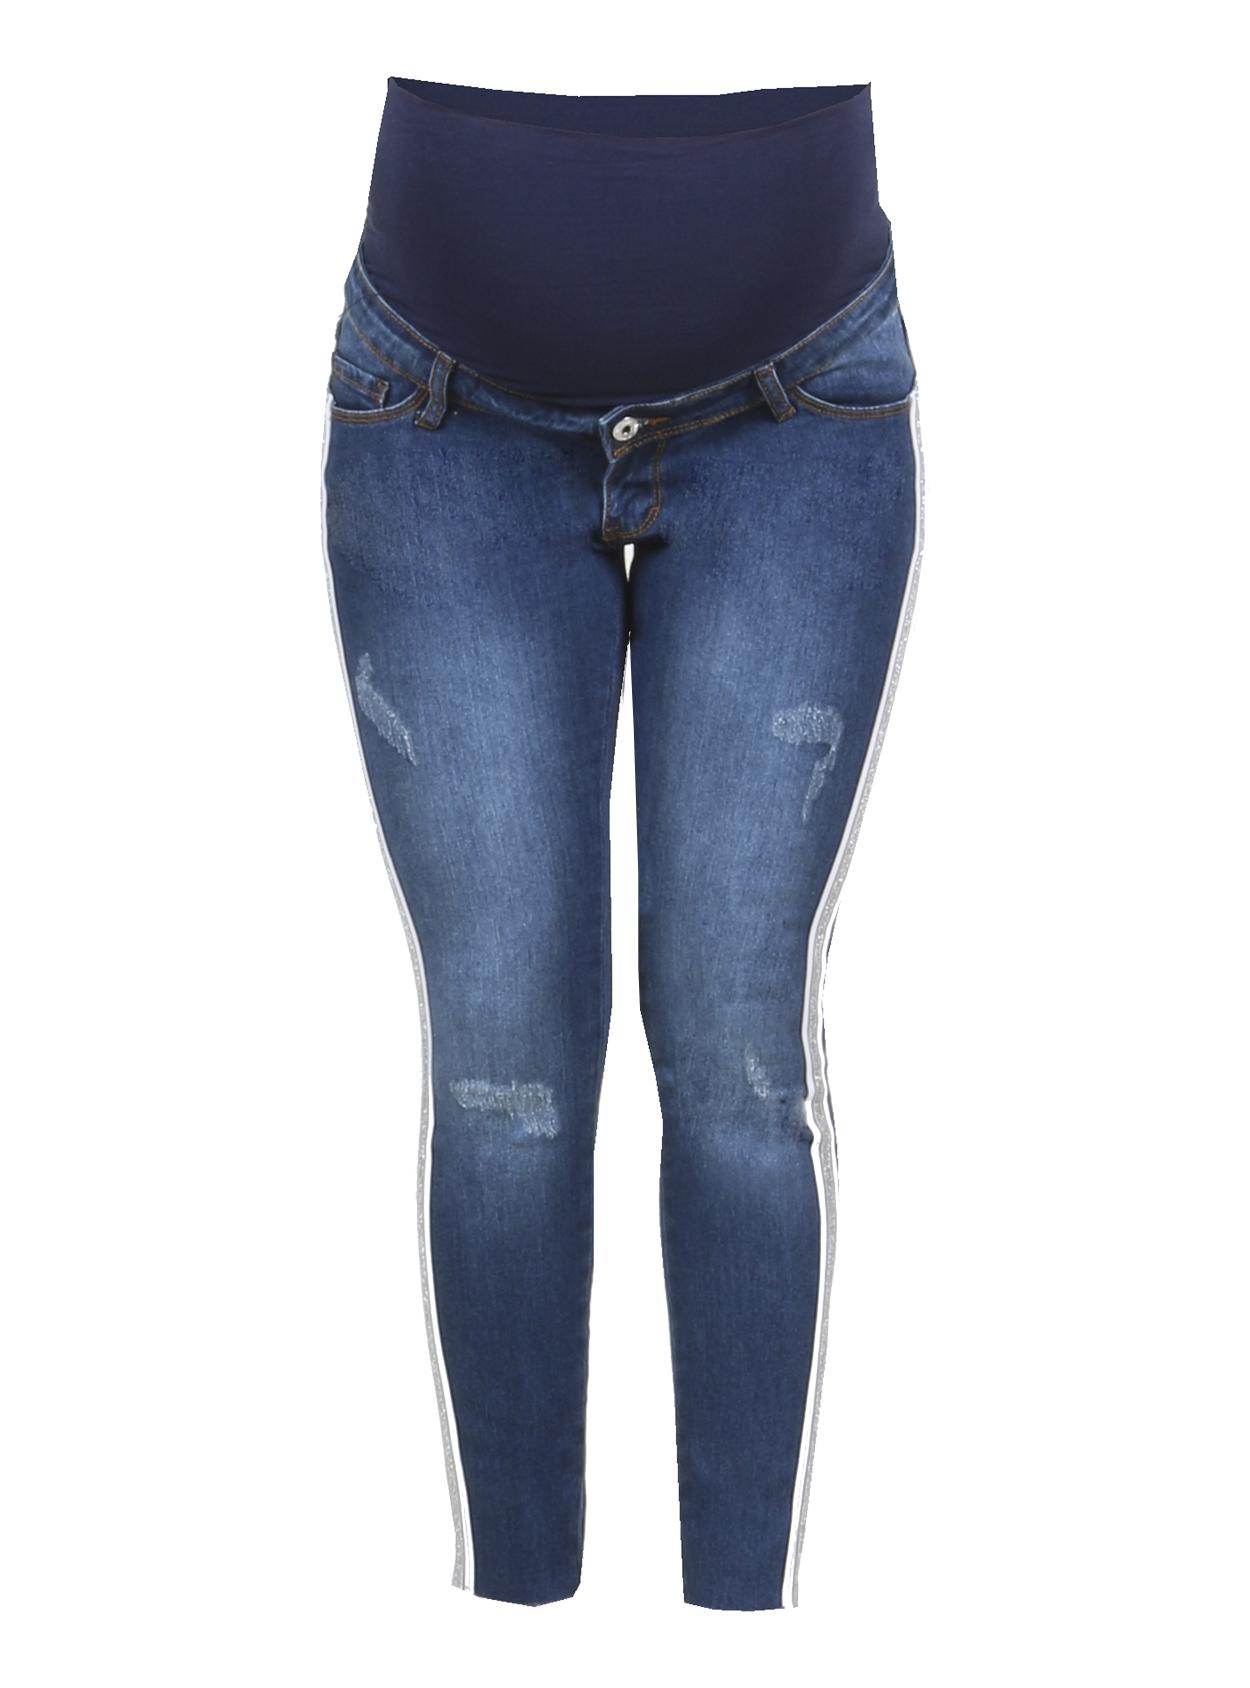 Jeans slim tobillero con tiras